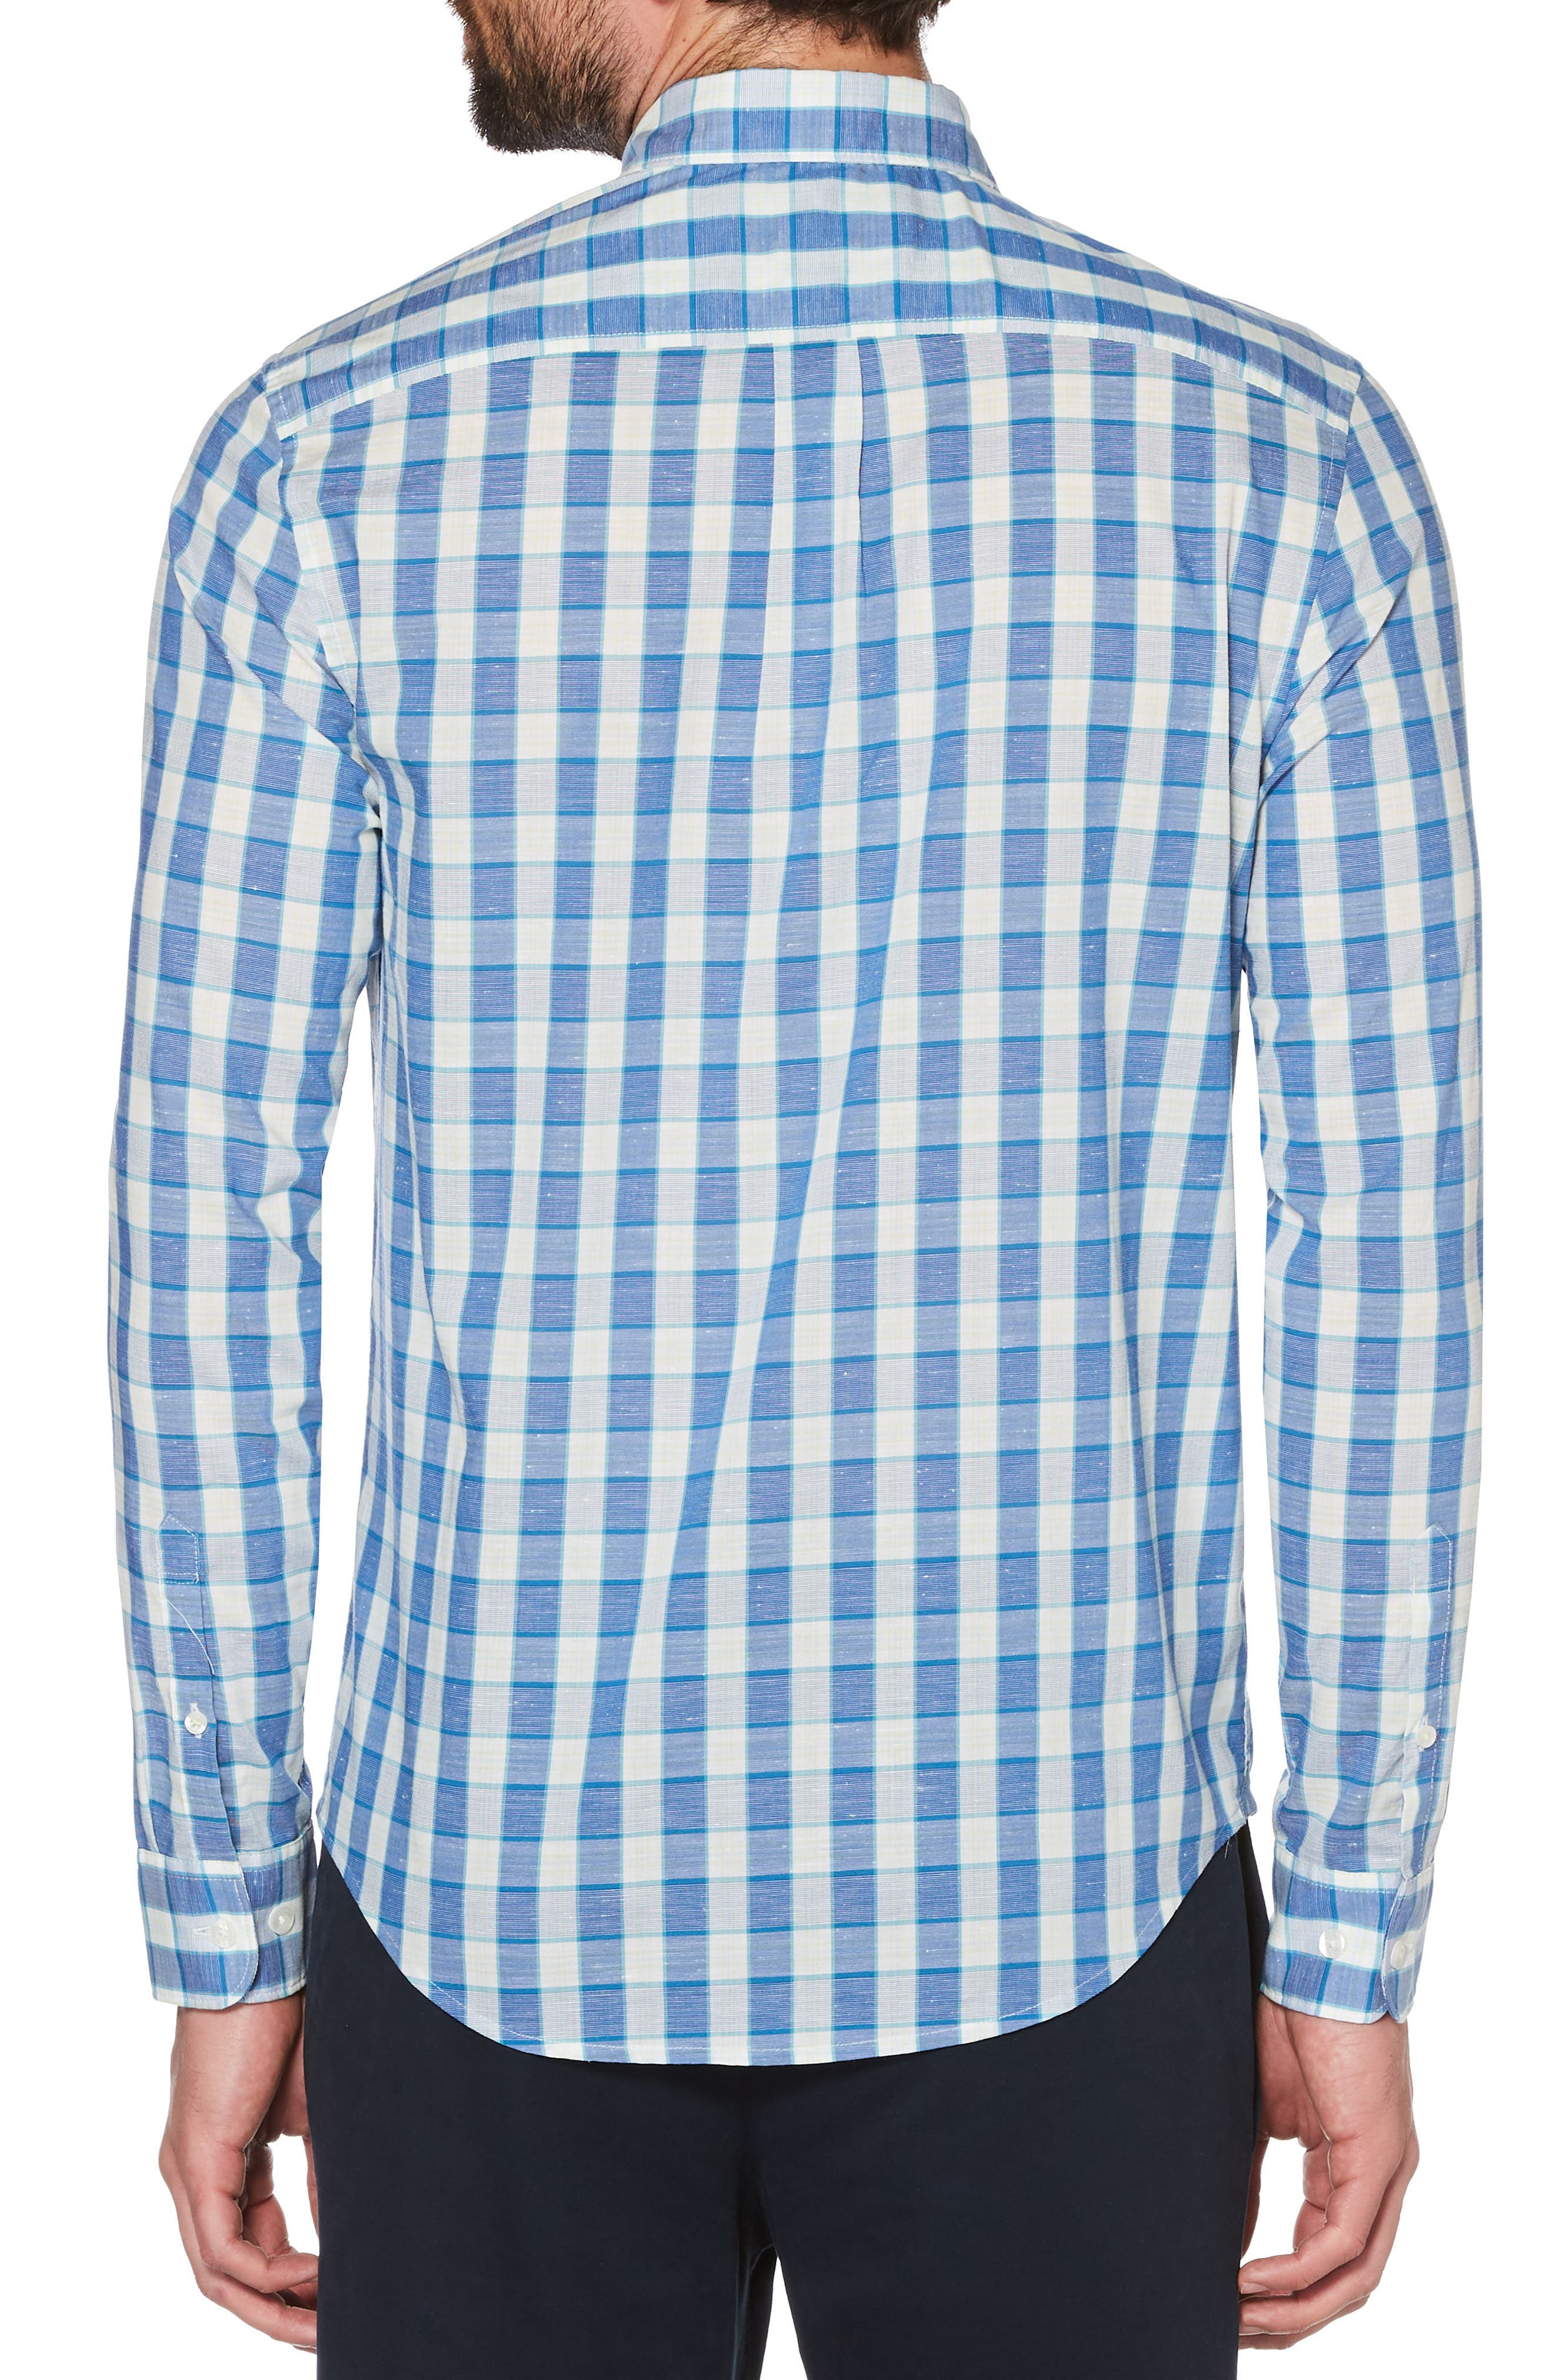 Nep Plaid Woven Shirt,                             Alternate thumbnail 2, color,                             462